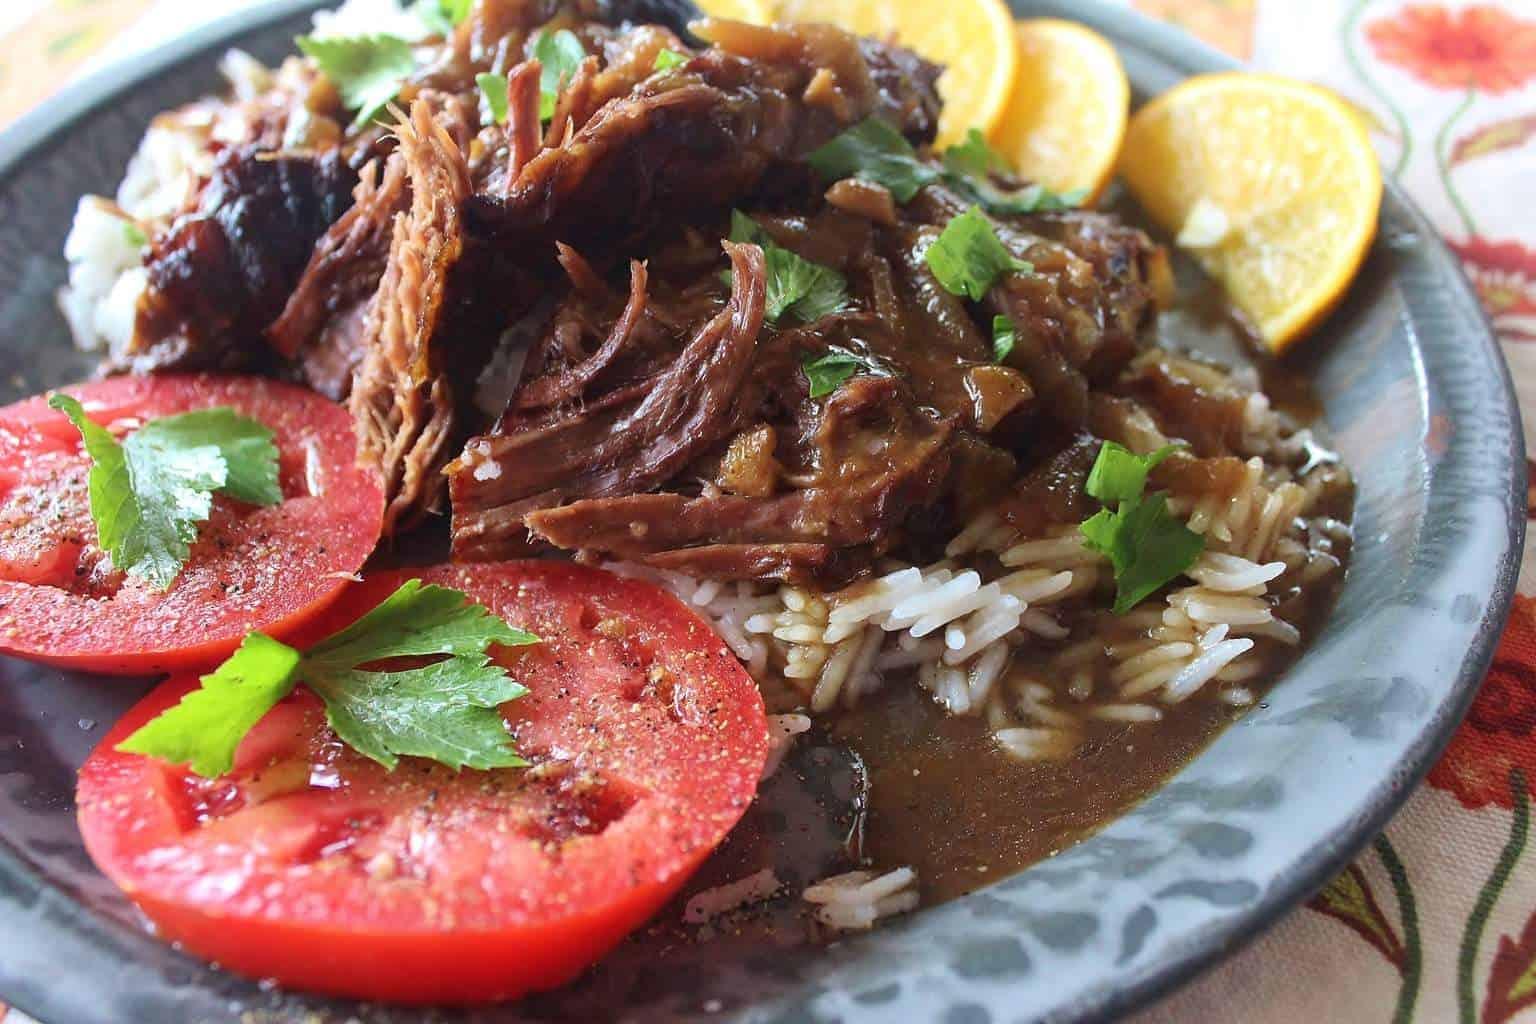 Surprise! (Recipe: Beef Pot Roast with Onion Gravy)